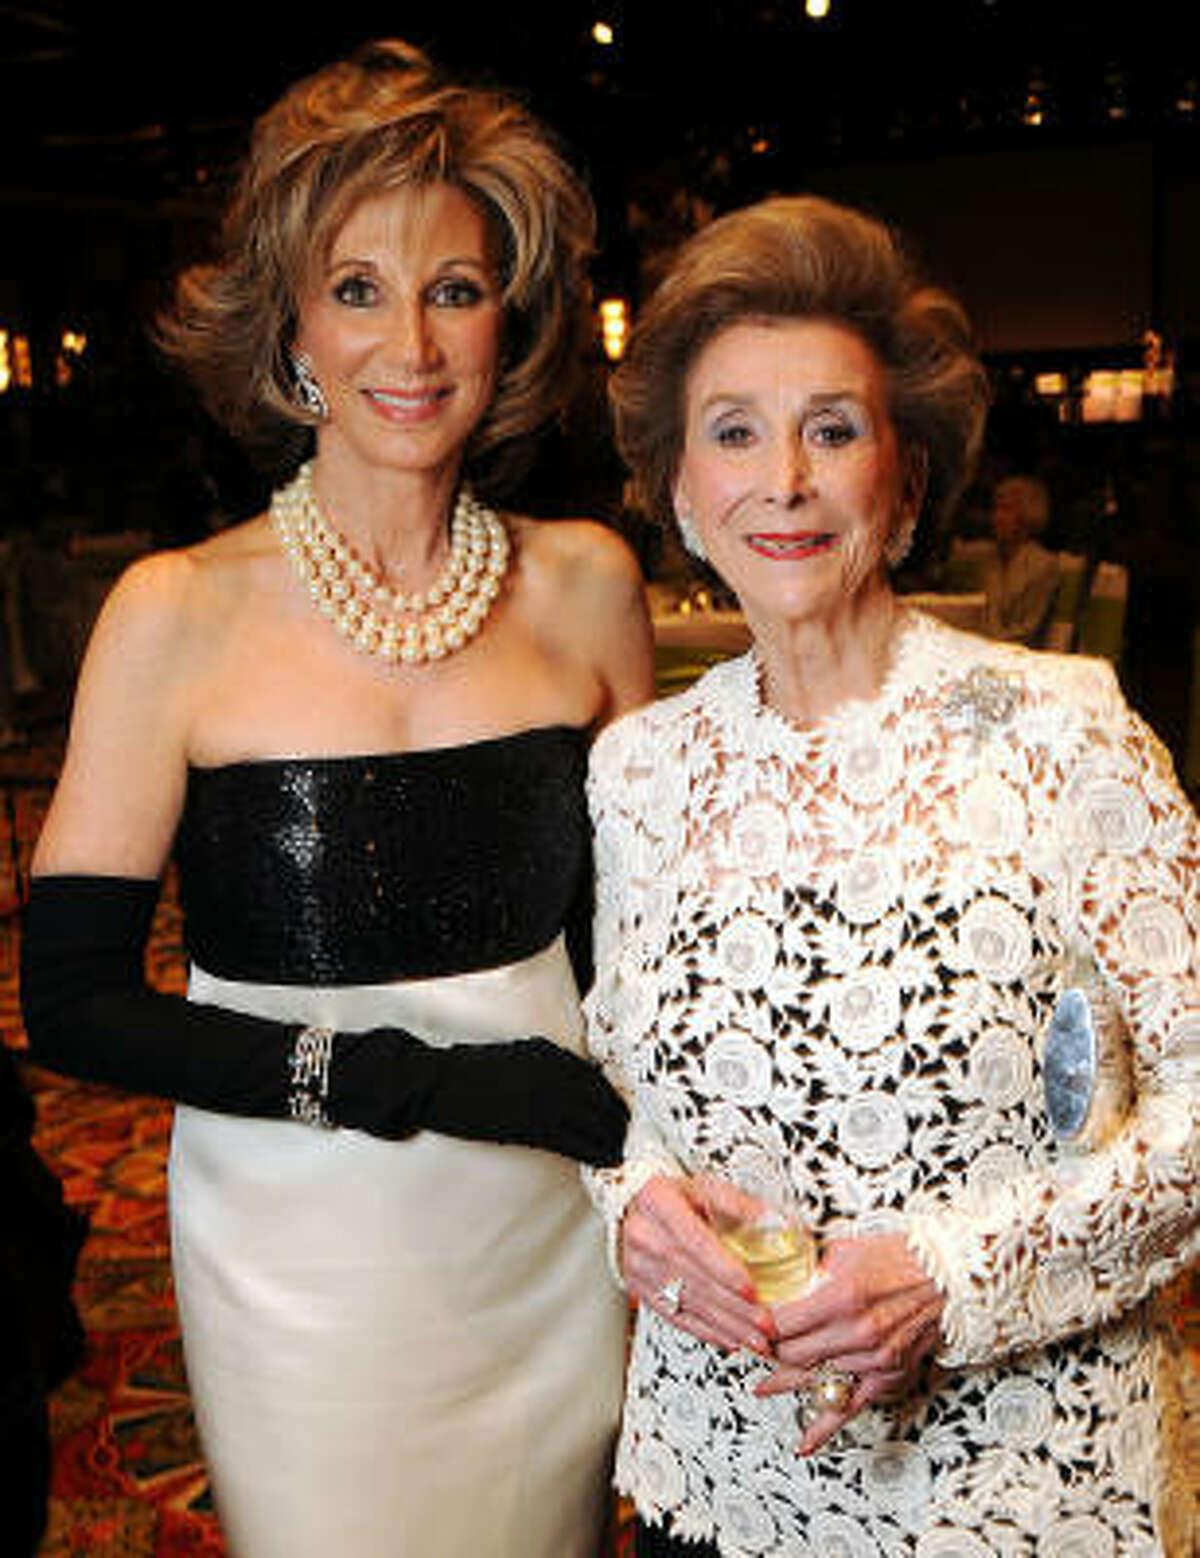 Frann Lichtenstein and honoree Aileen Gordon at the 2010 Houston Symphony Ball.